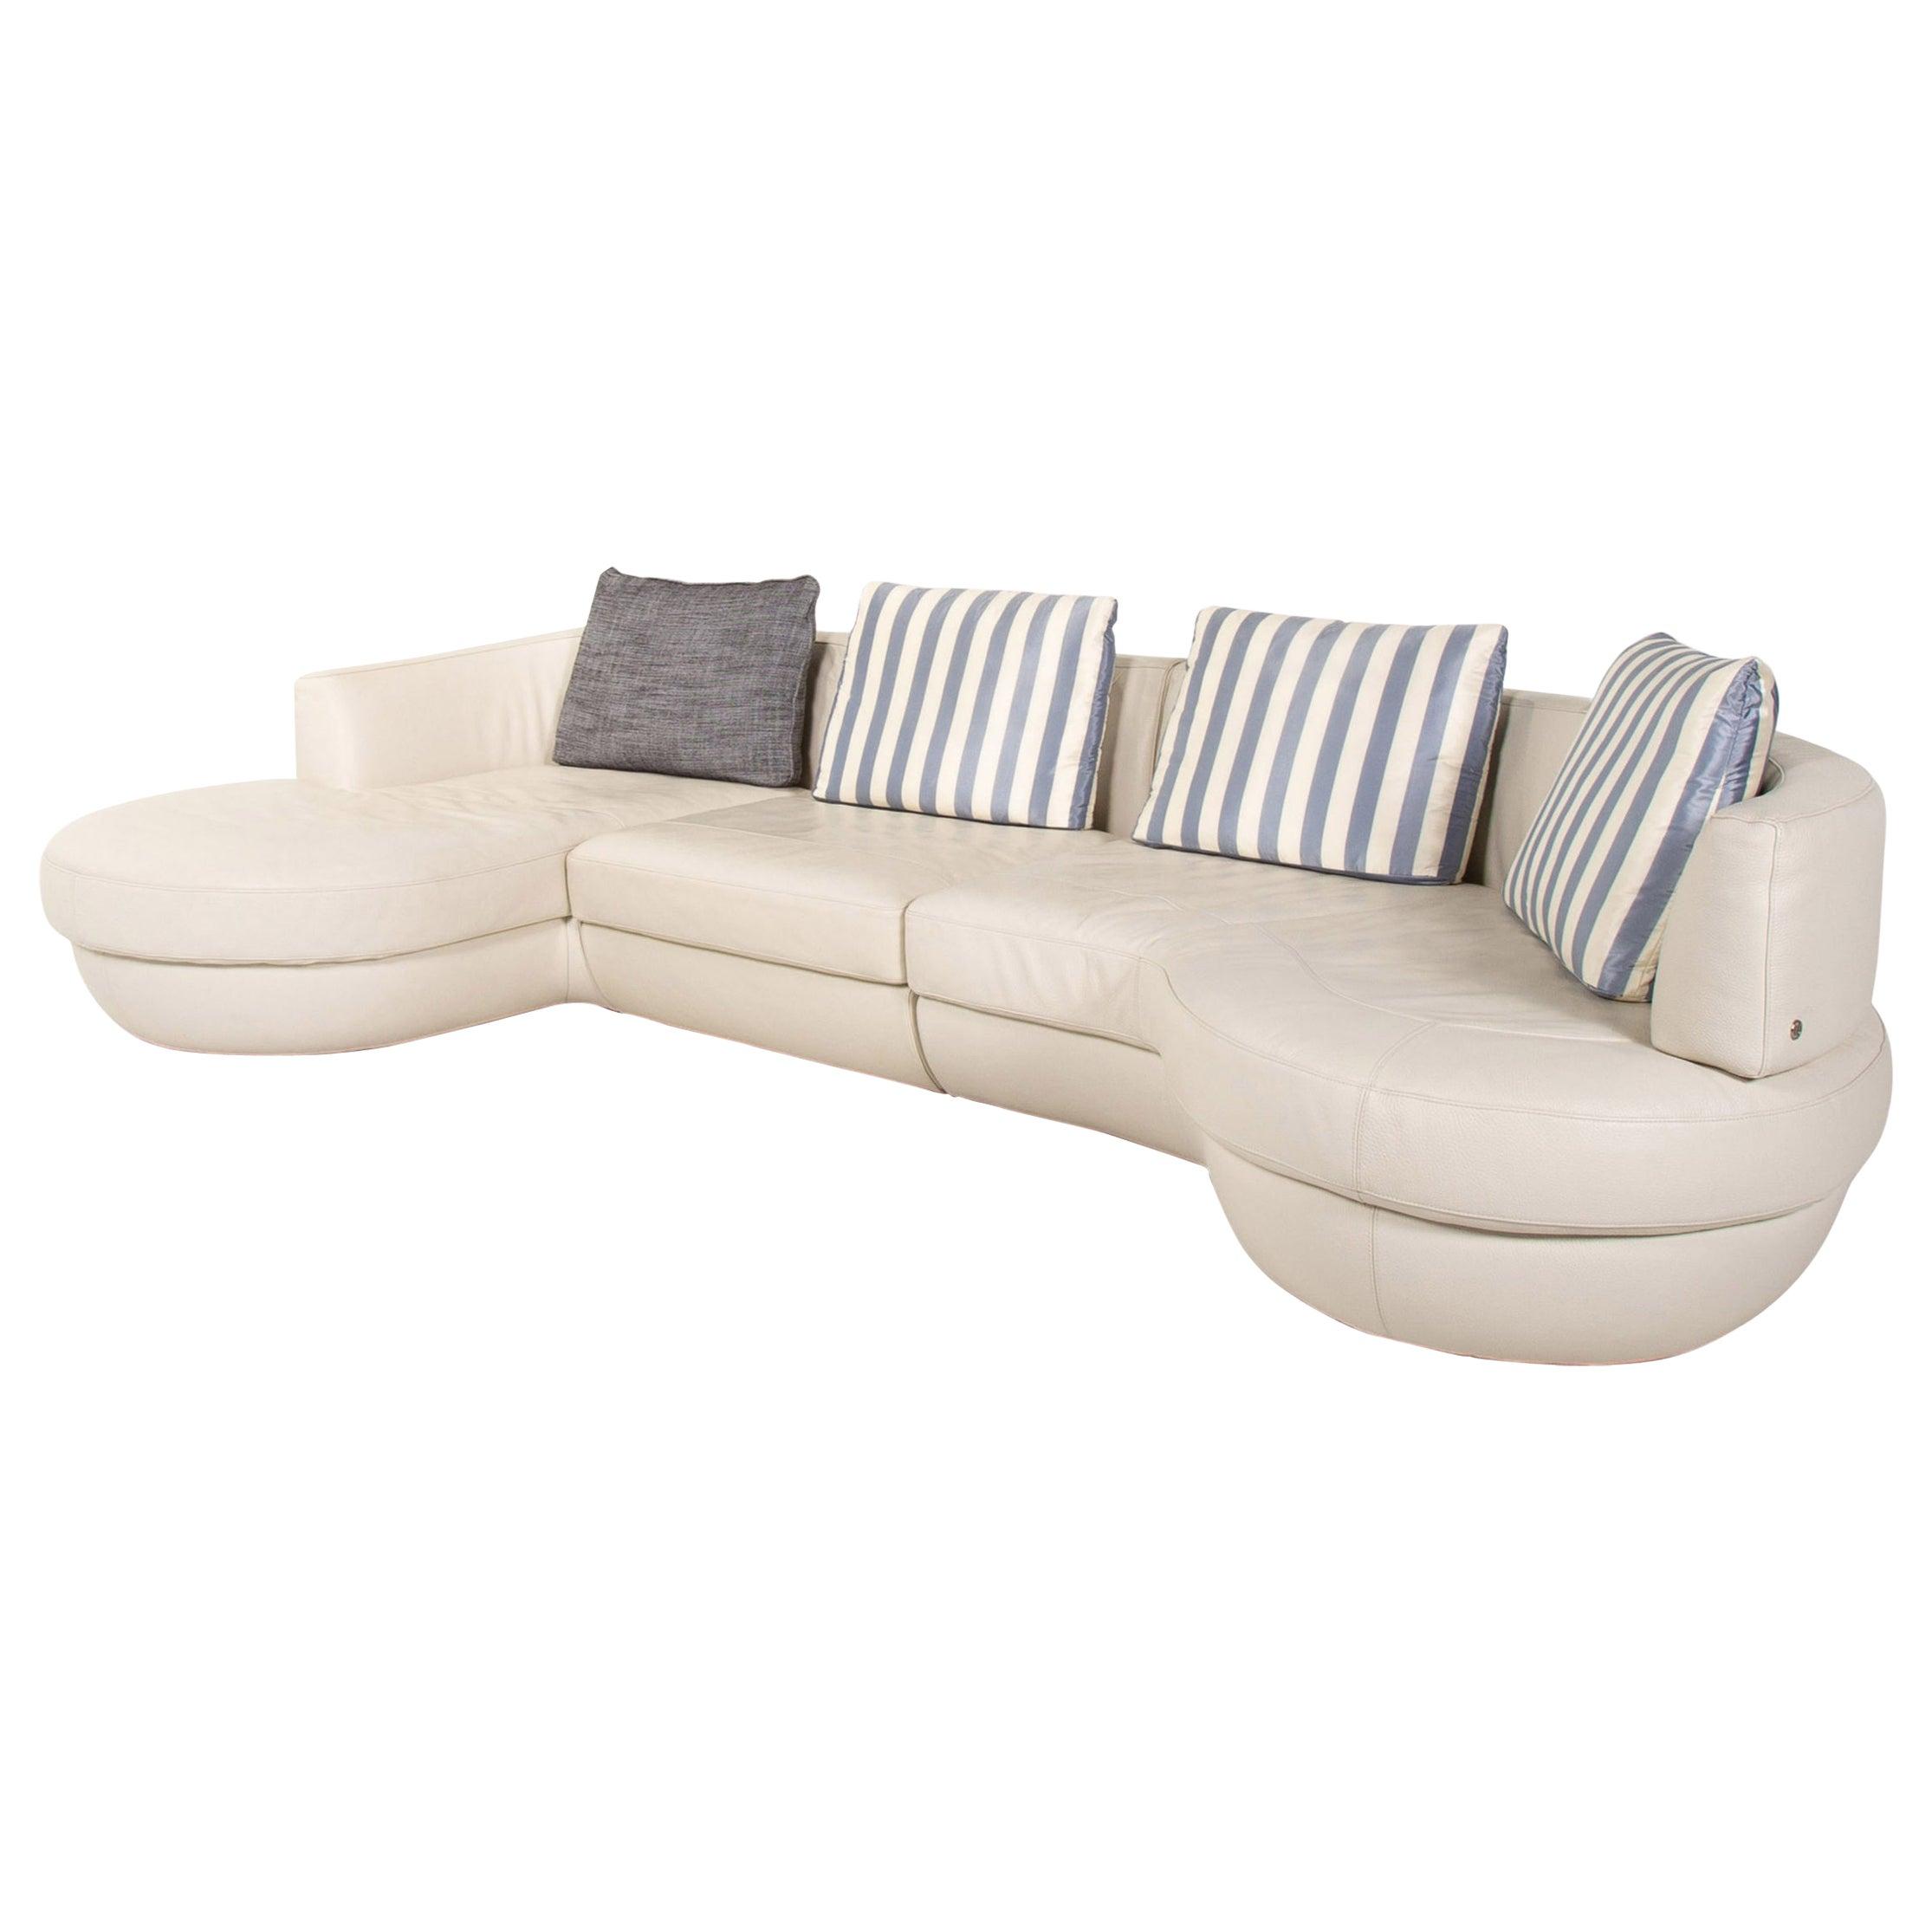 Natuzzi Leather Corner Sofa White Sofa Couch